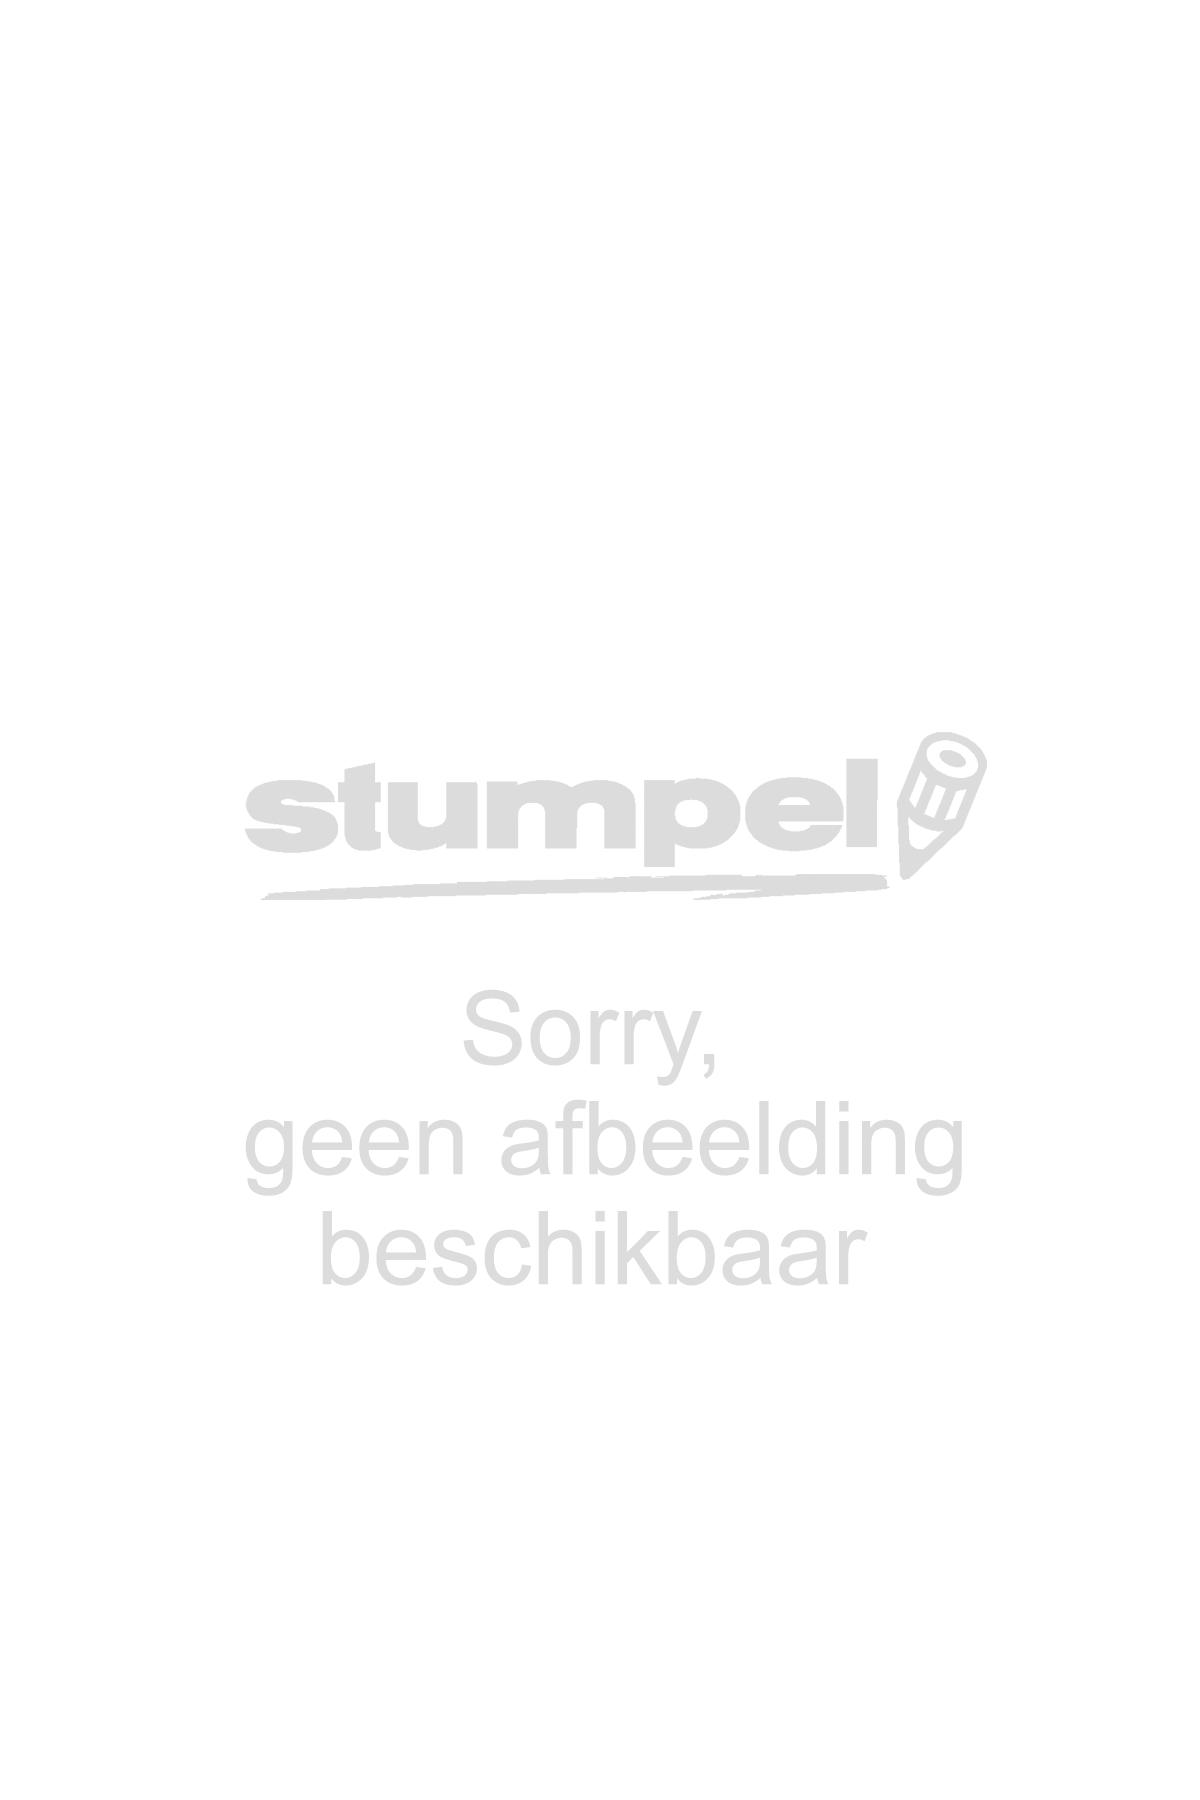 briefopener-ronia-002-171-troffelmodel-960177